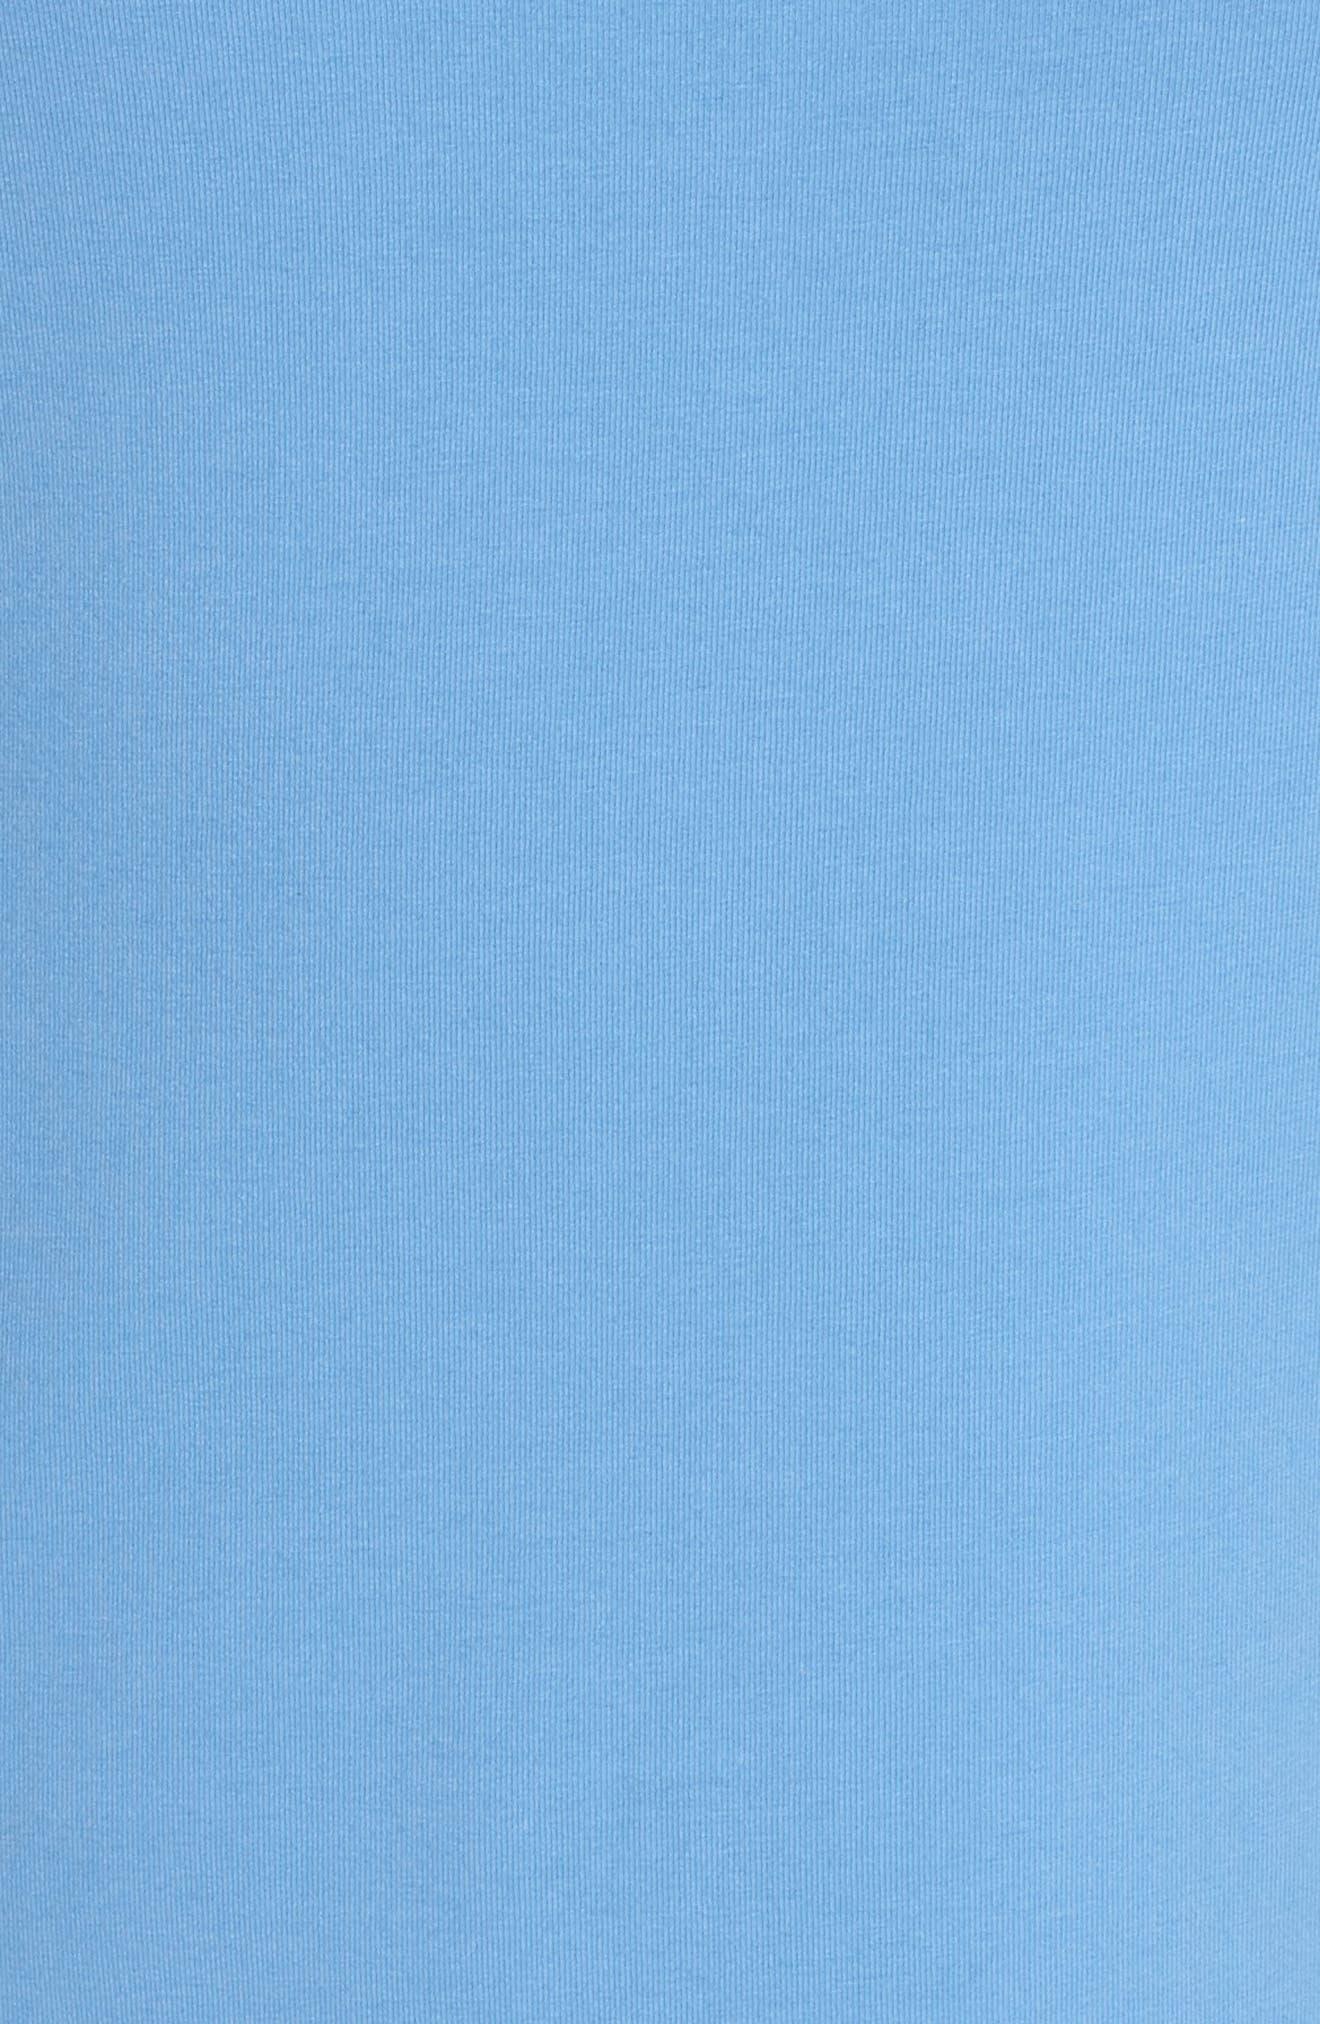 Perfect Scoop Neck Tank,                             Alternate thumbnail 5, color,                             BLUE HAZE